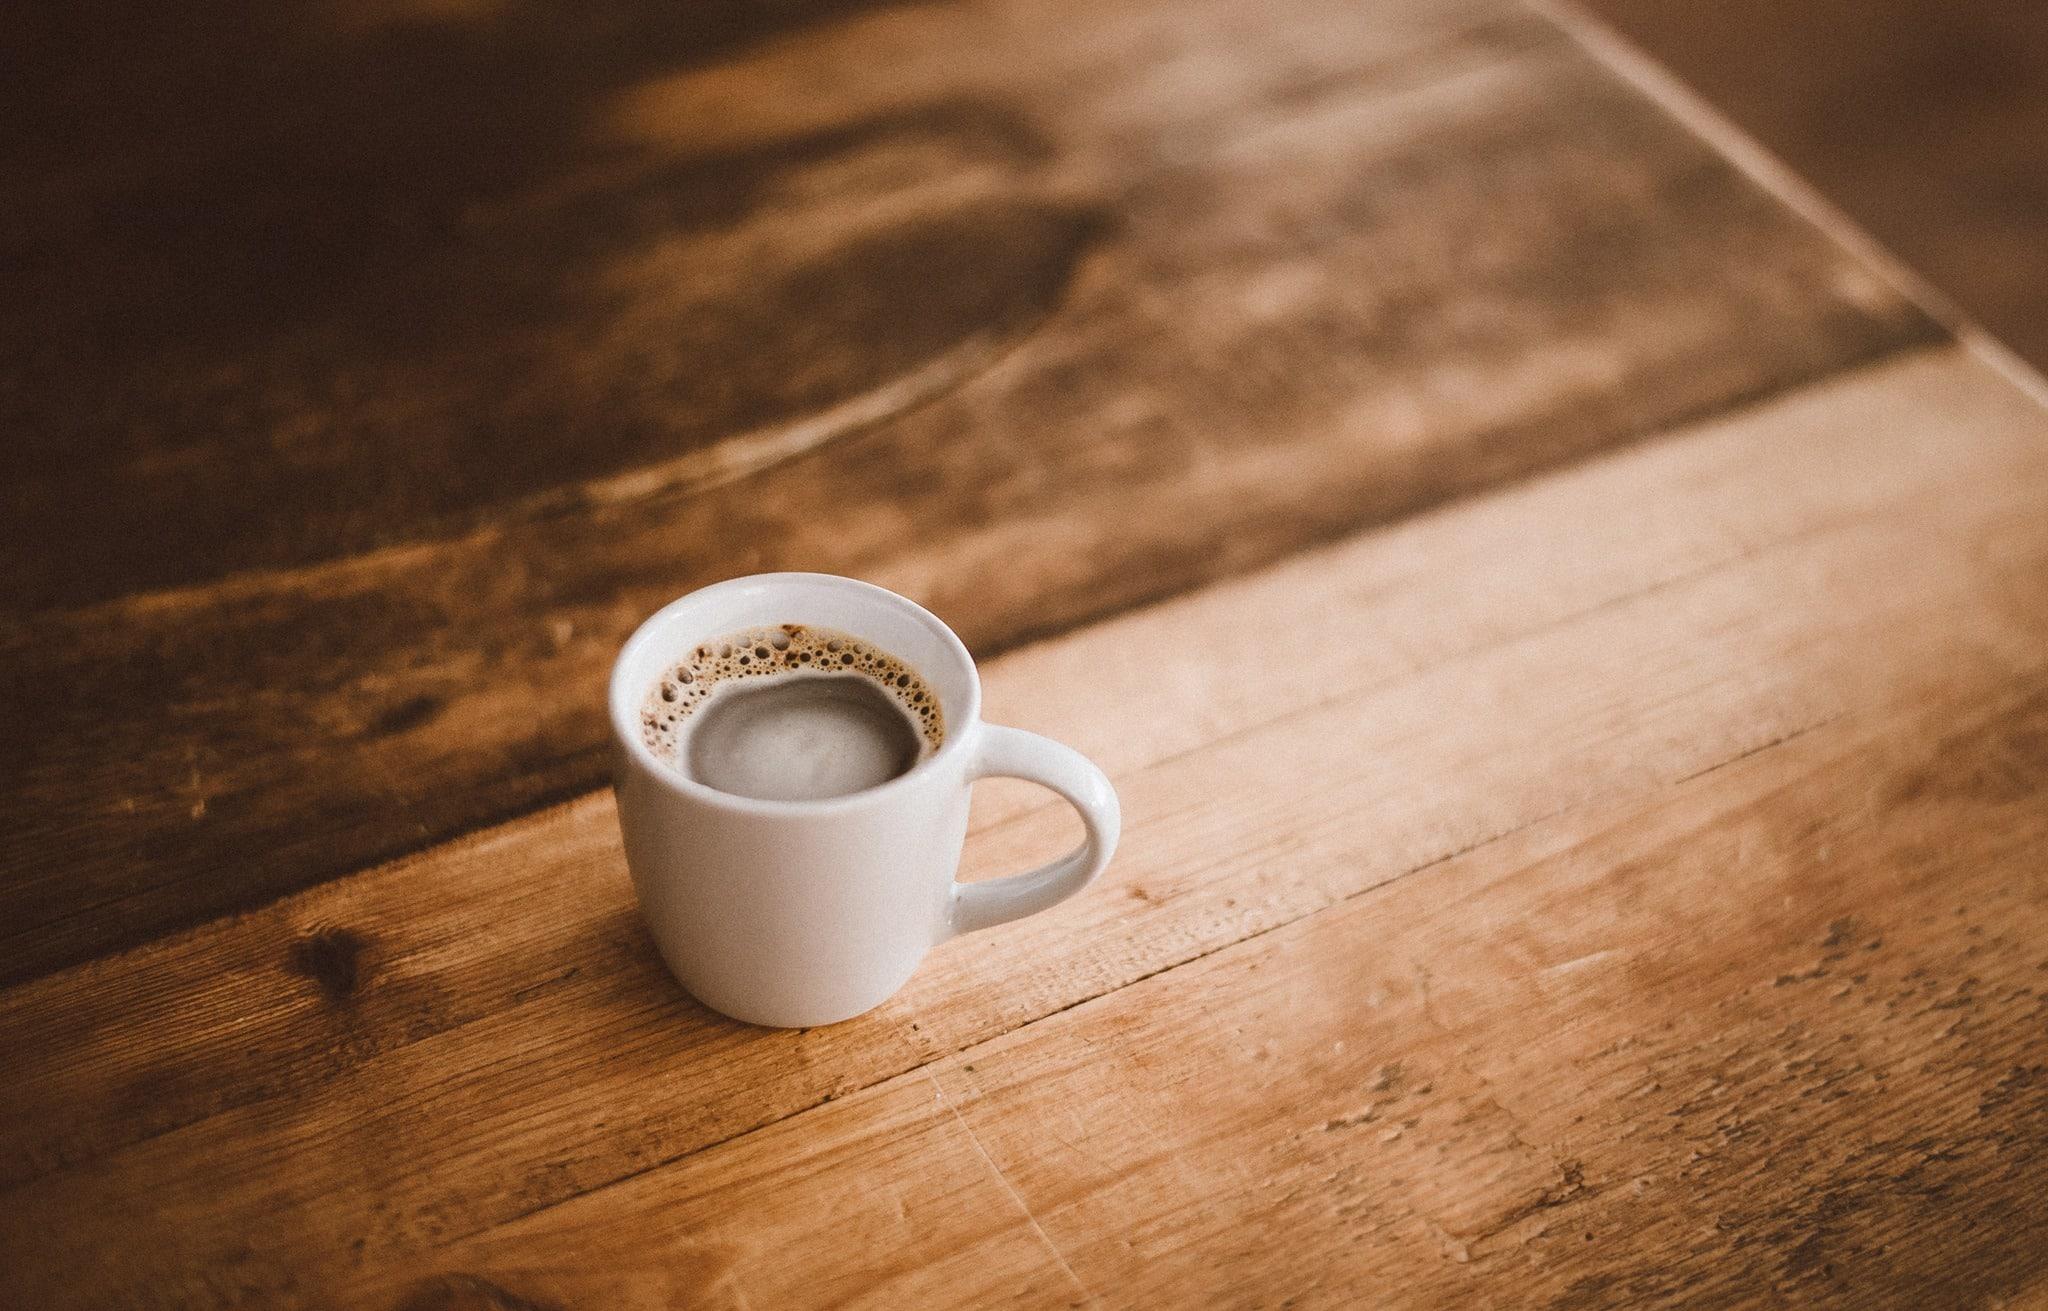 How to Make Keto Coffee